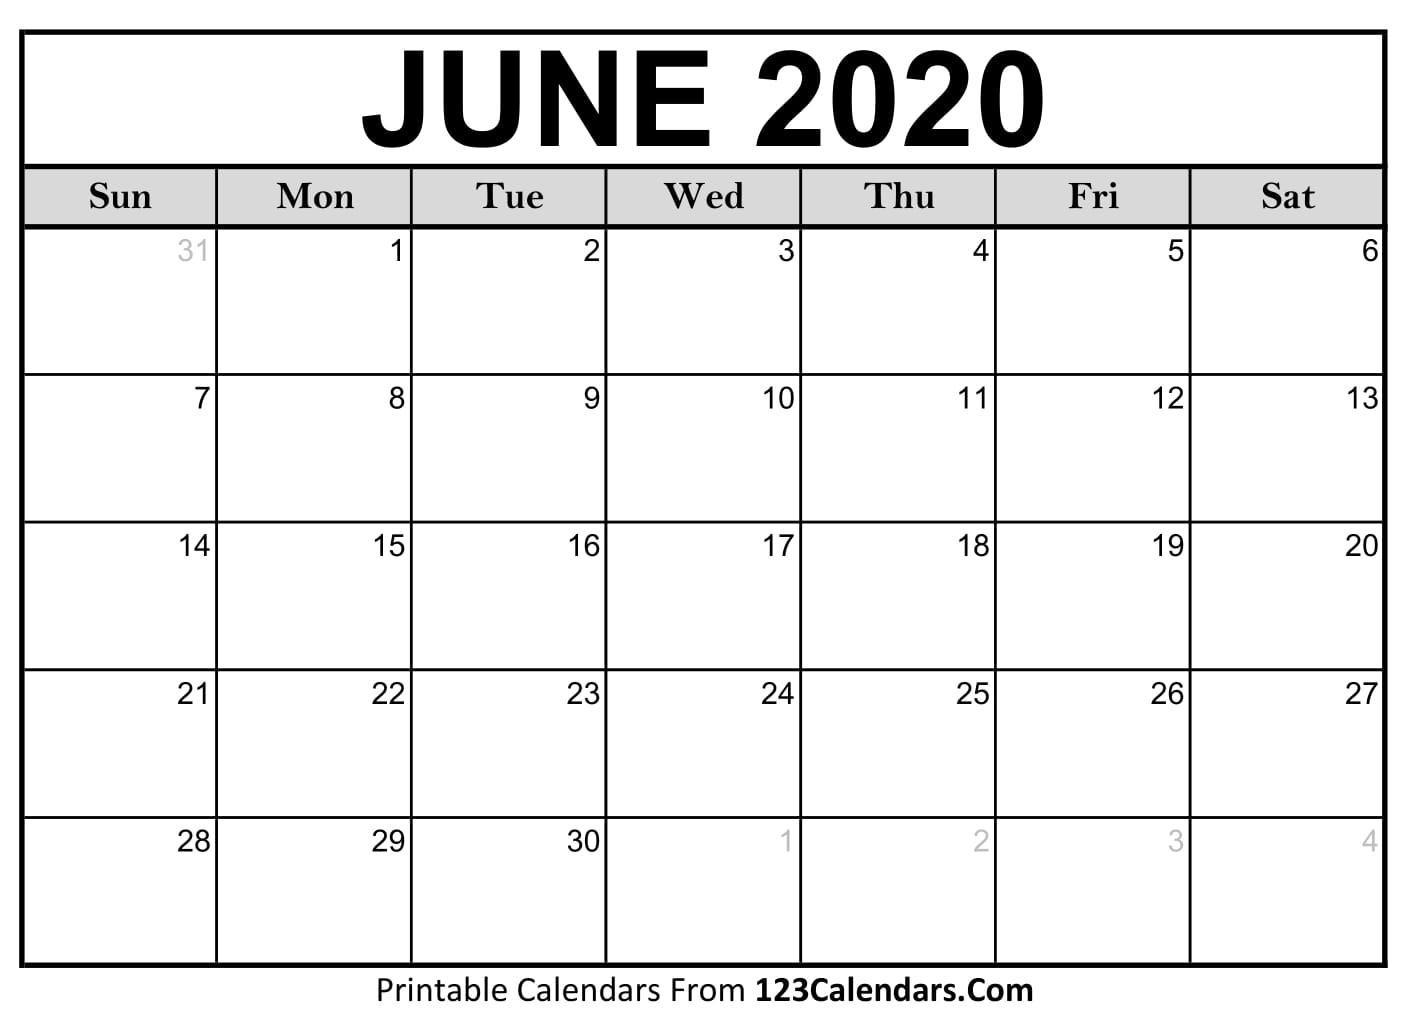 June 2020 Printable Calendar | 123Calendars within Free Calendar July 2019-June 2020